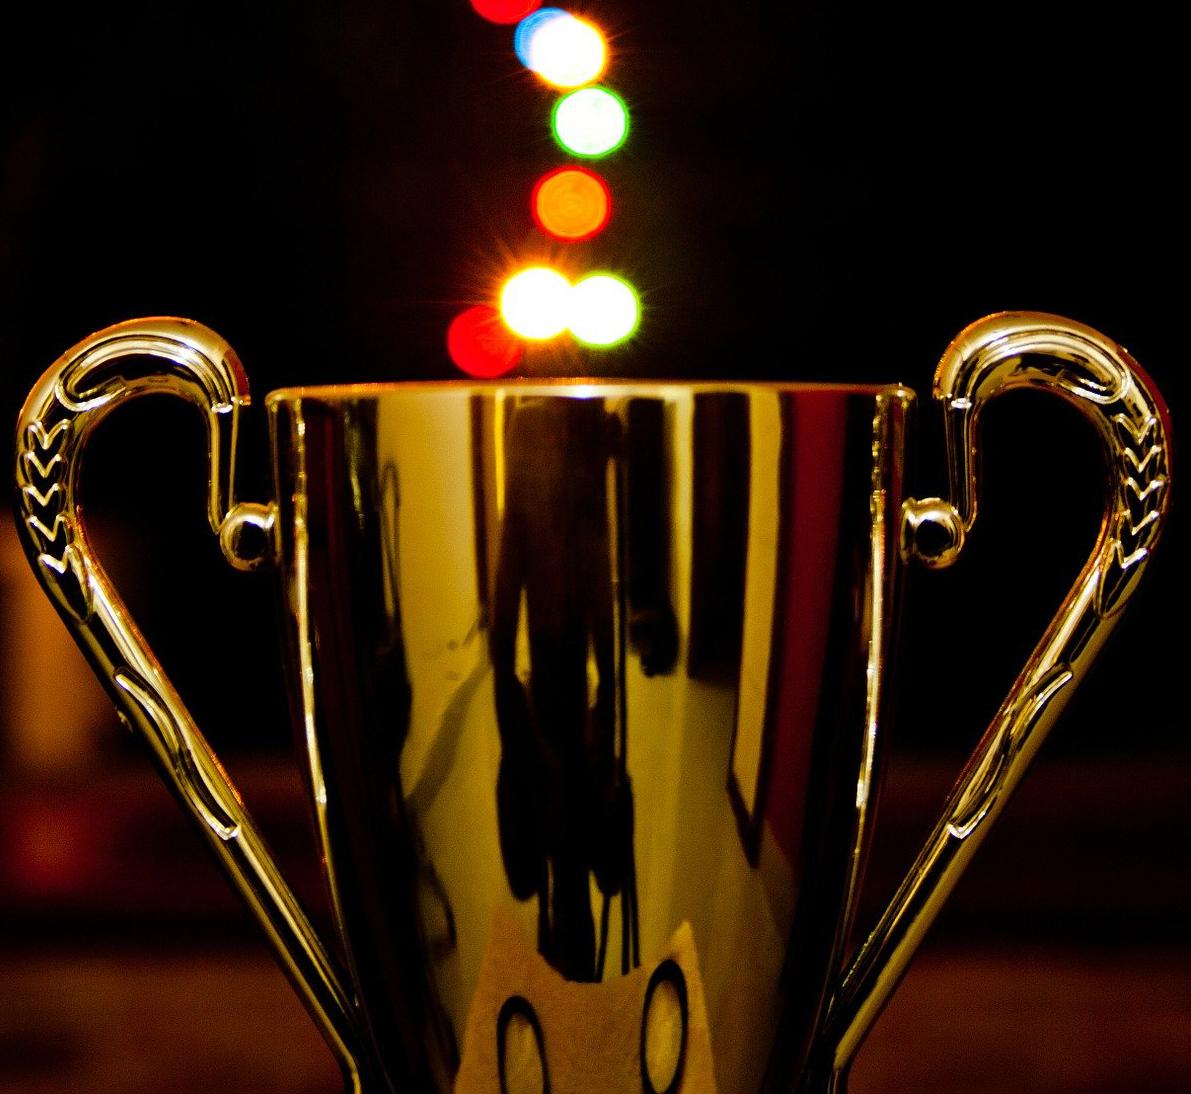 Baker Creative Wins International Award